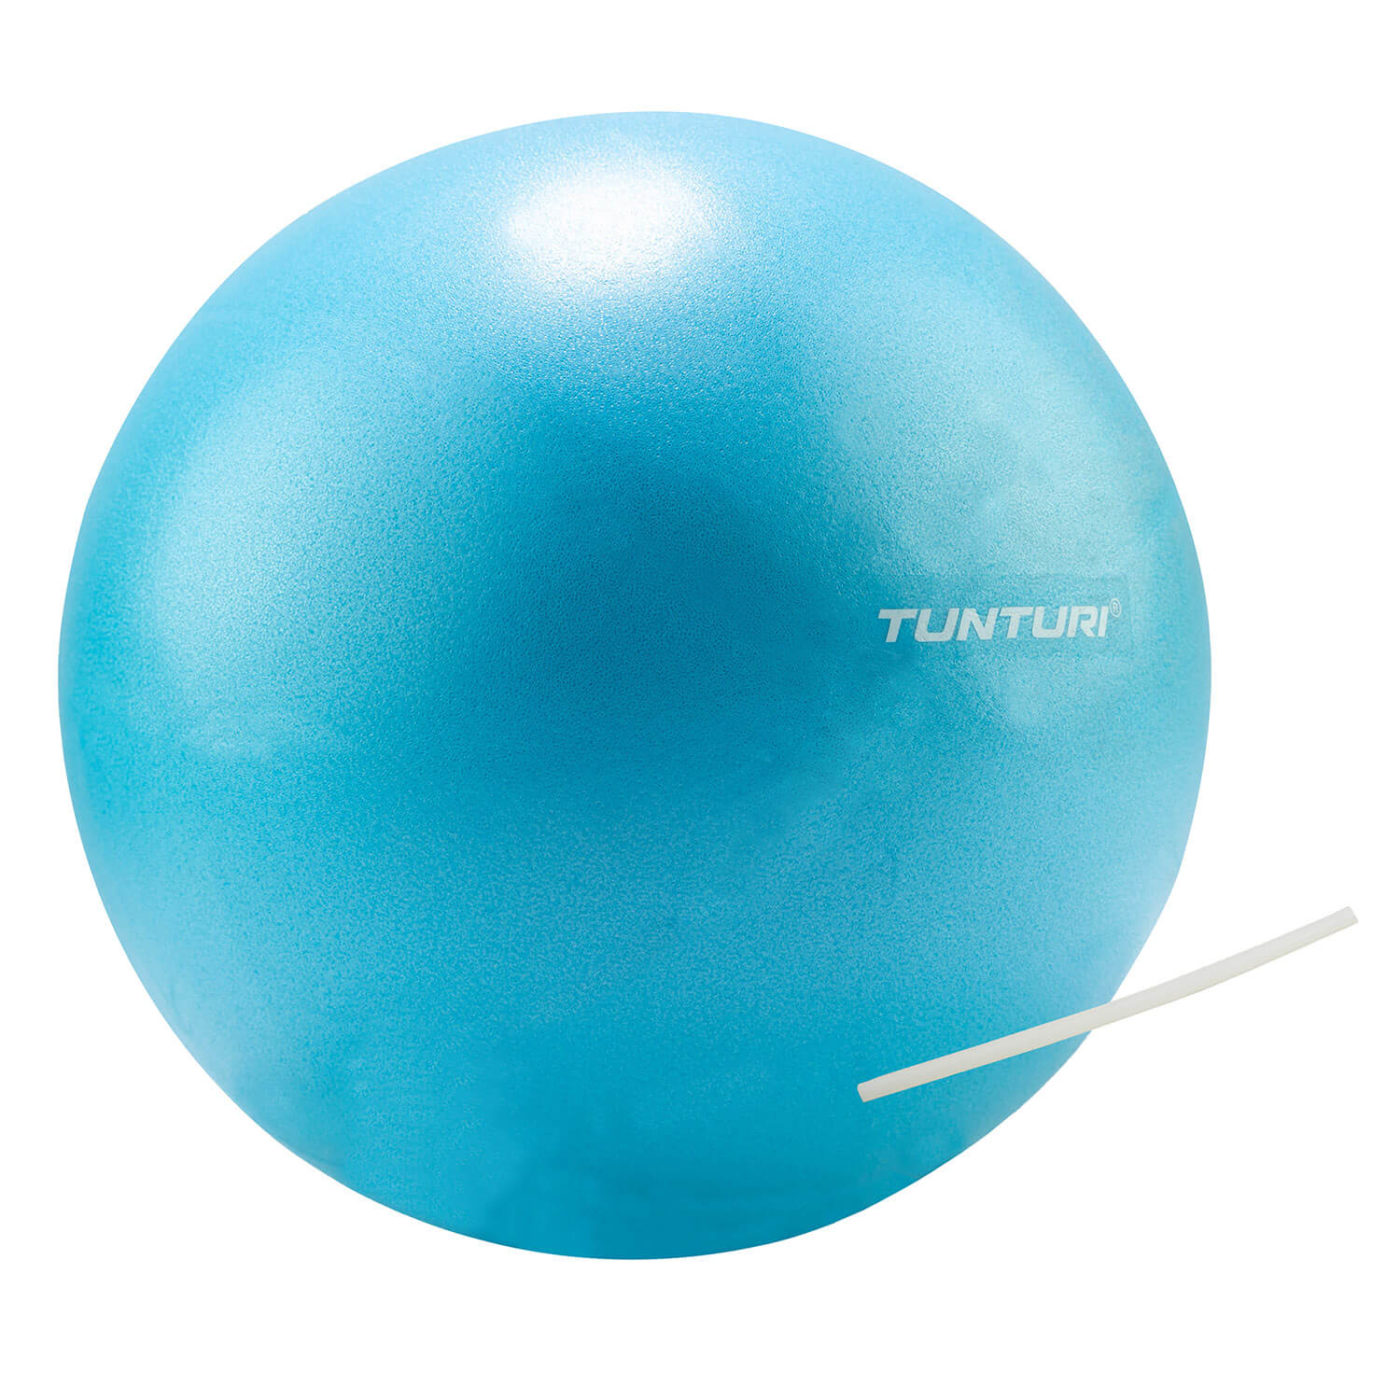 Tunturi Fitnessbal - Yoga bal - Gymball - 25cm diameter - Blauw